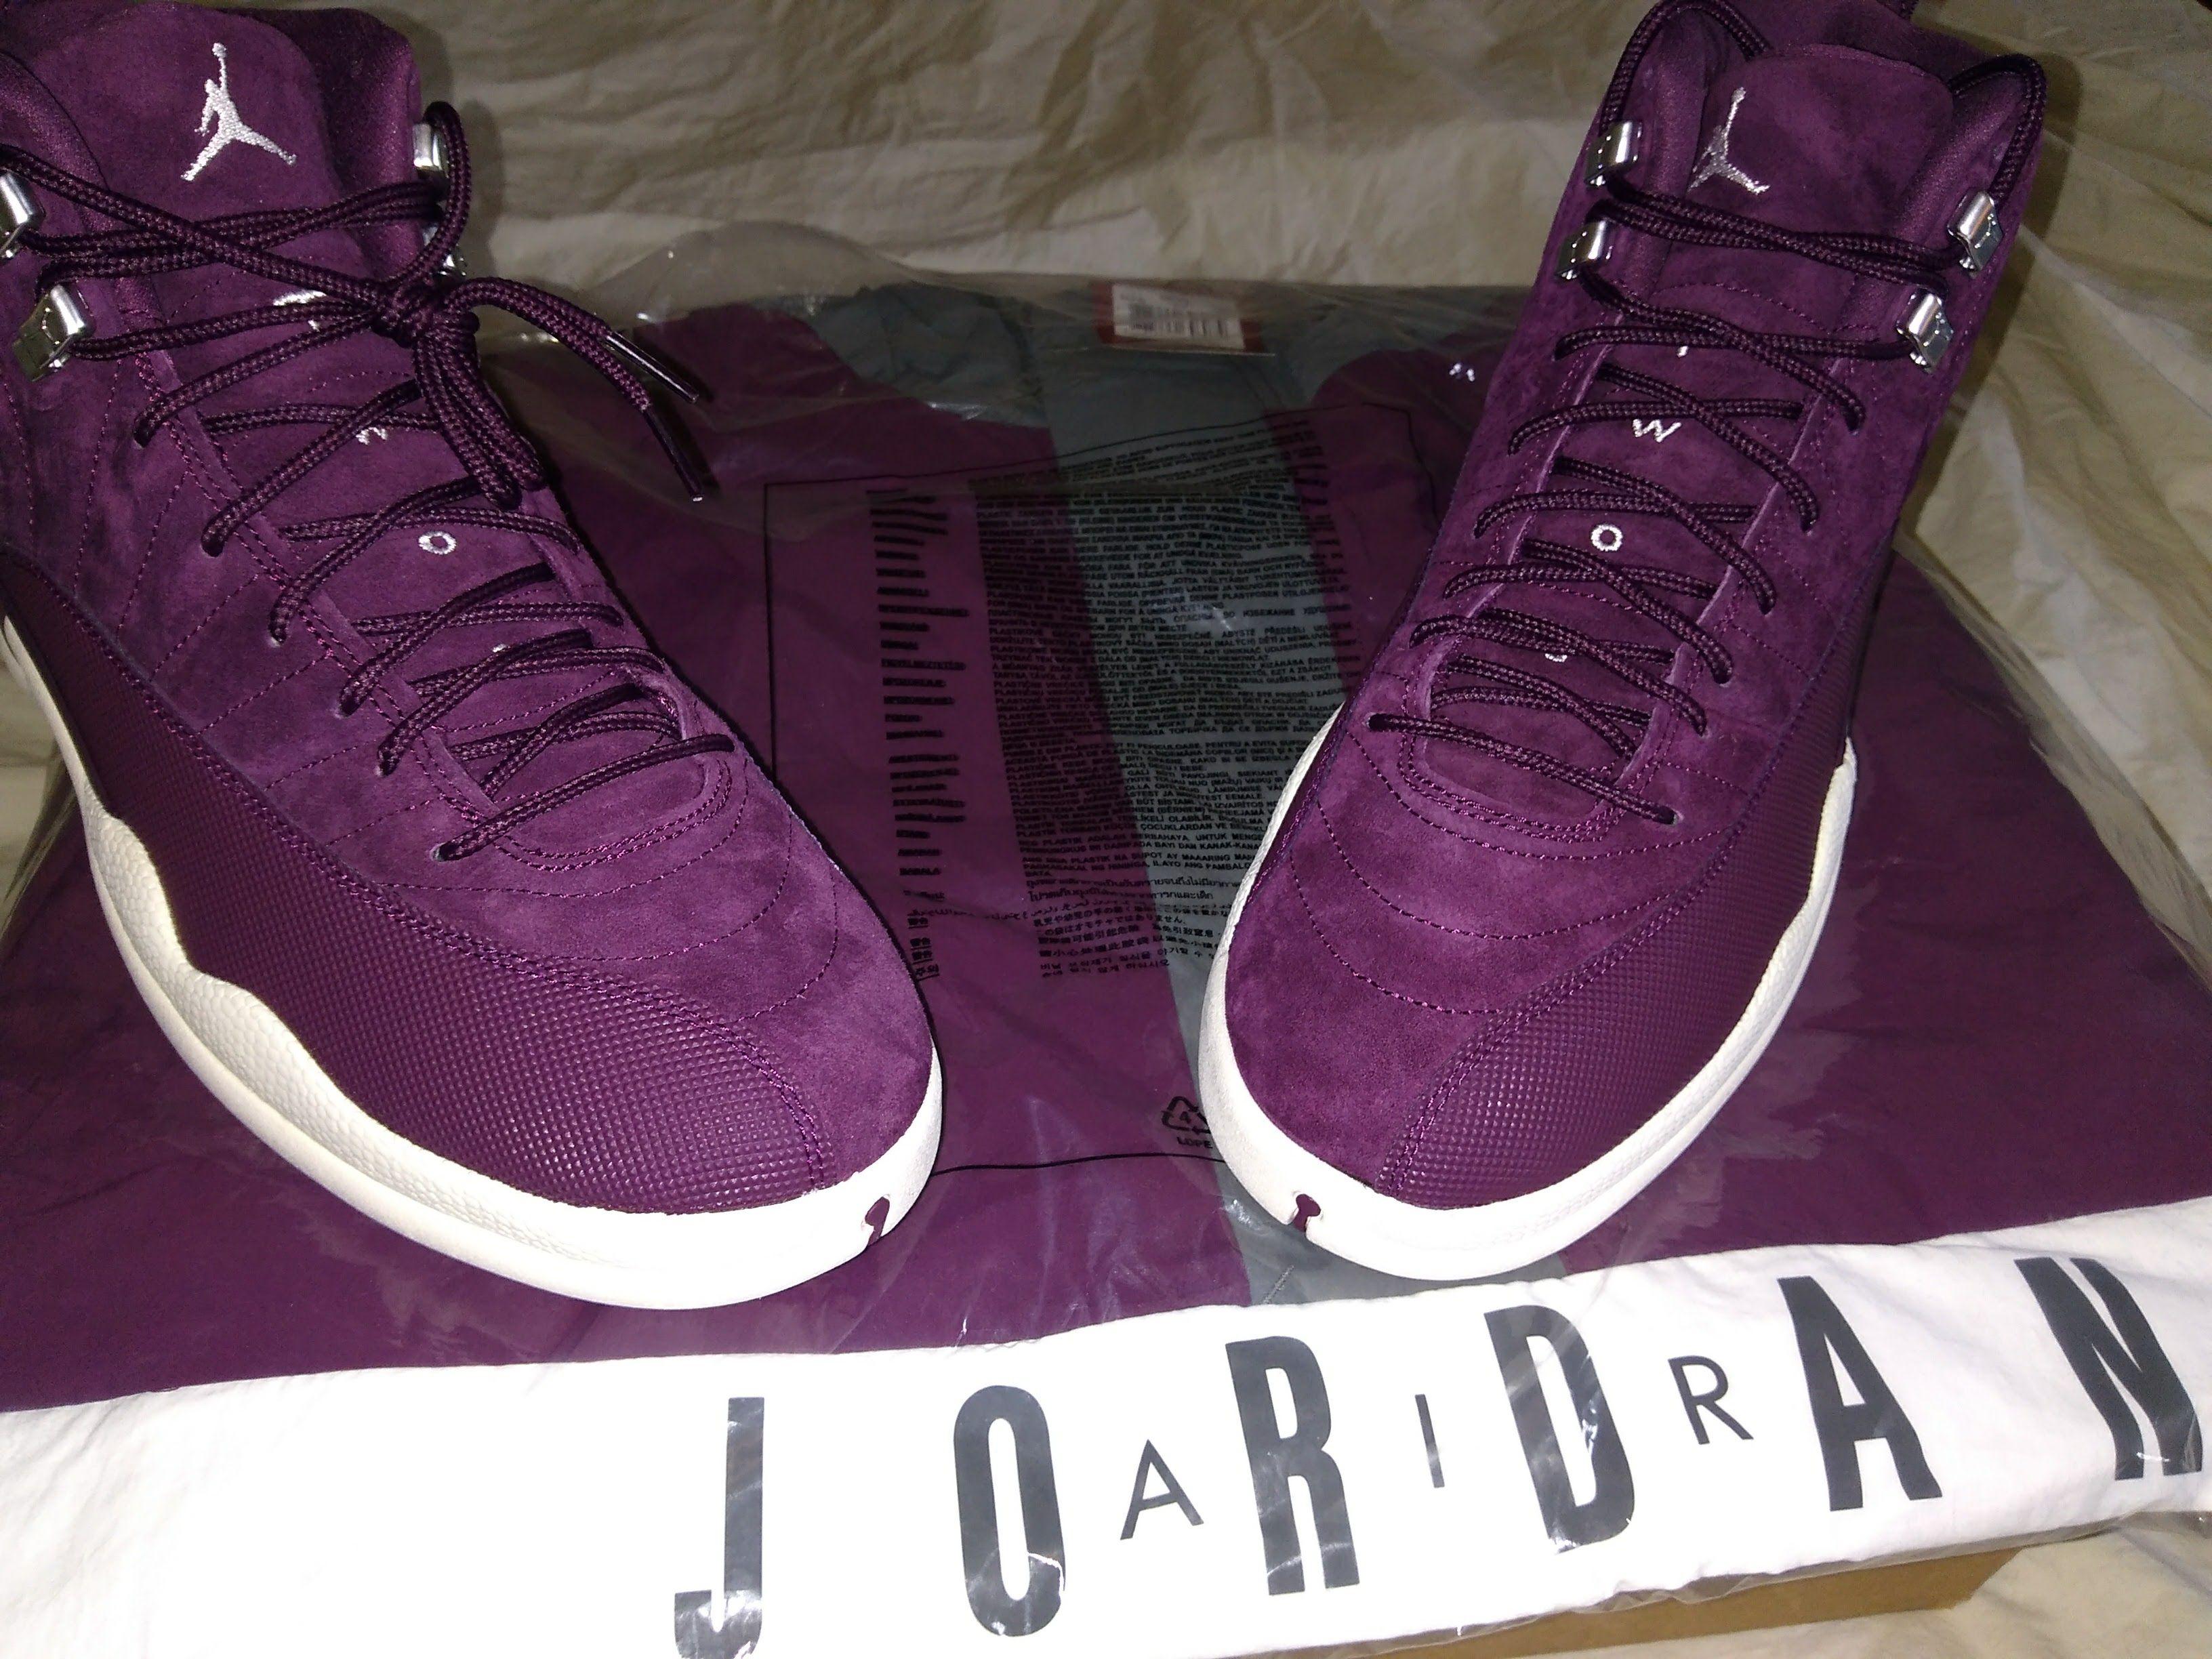 #JordanAnorak #NikeJacket by #NBA #basketball former #superstar #MichaelJordan - https://drewrynewsnetwork.com/forum/shoe-reviews/sneaker-reviews